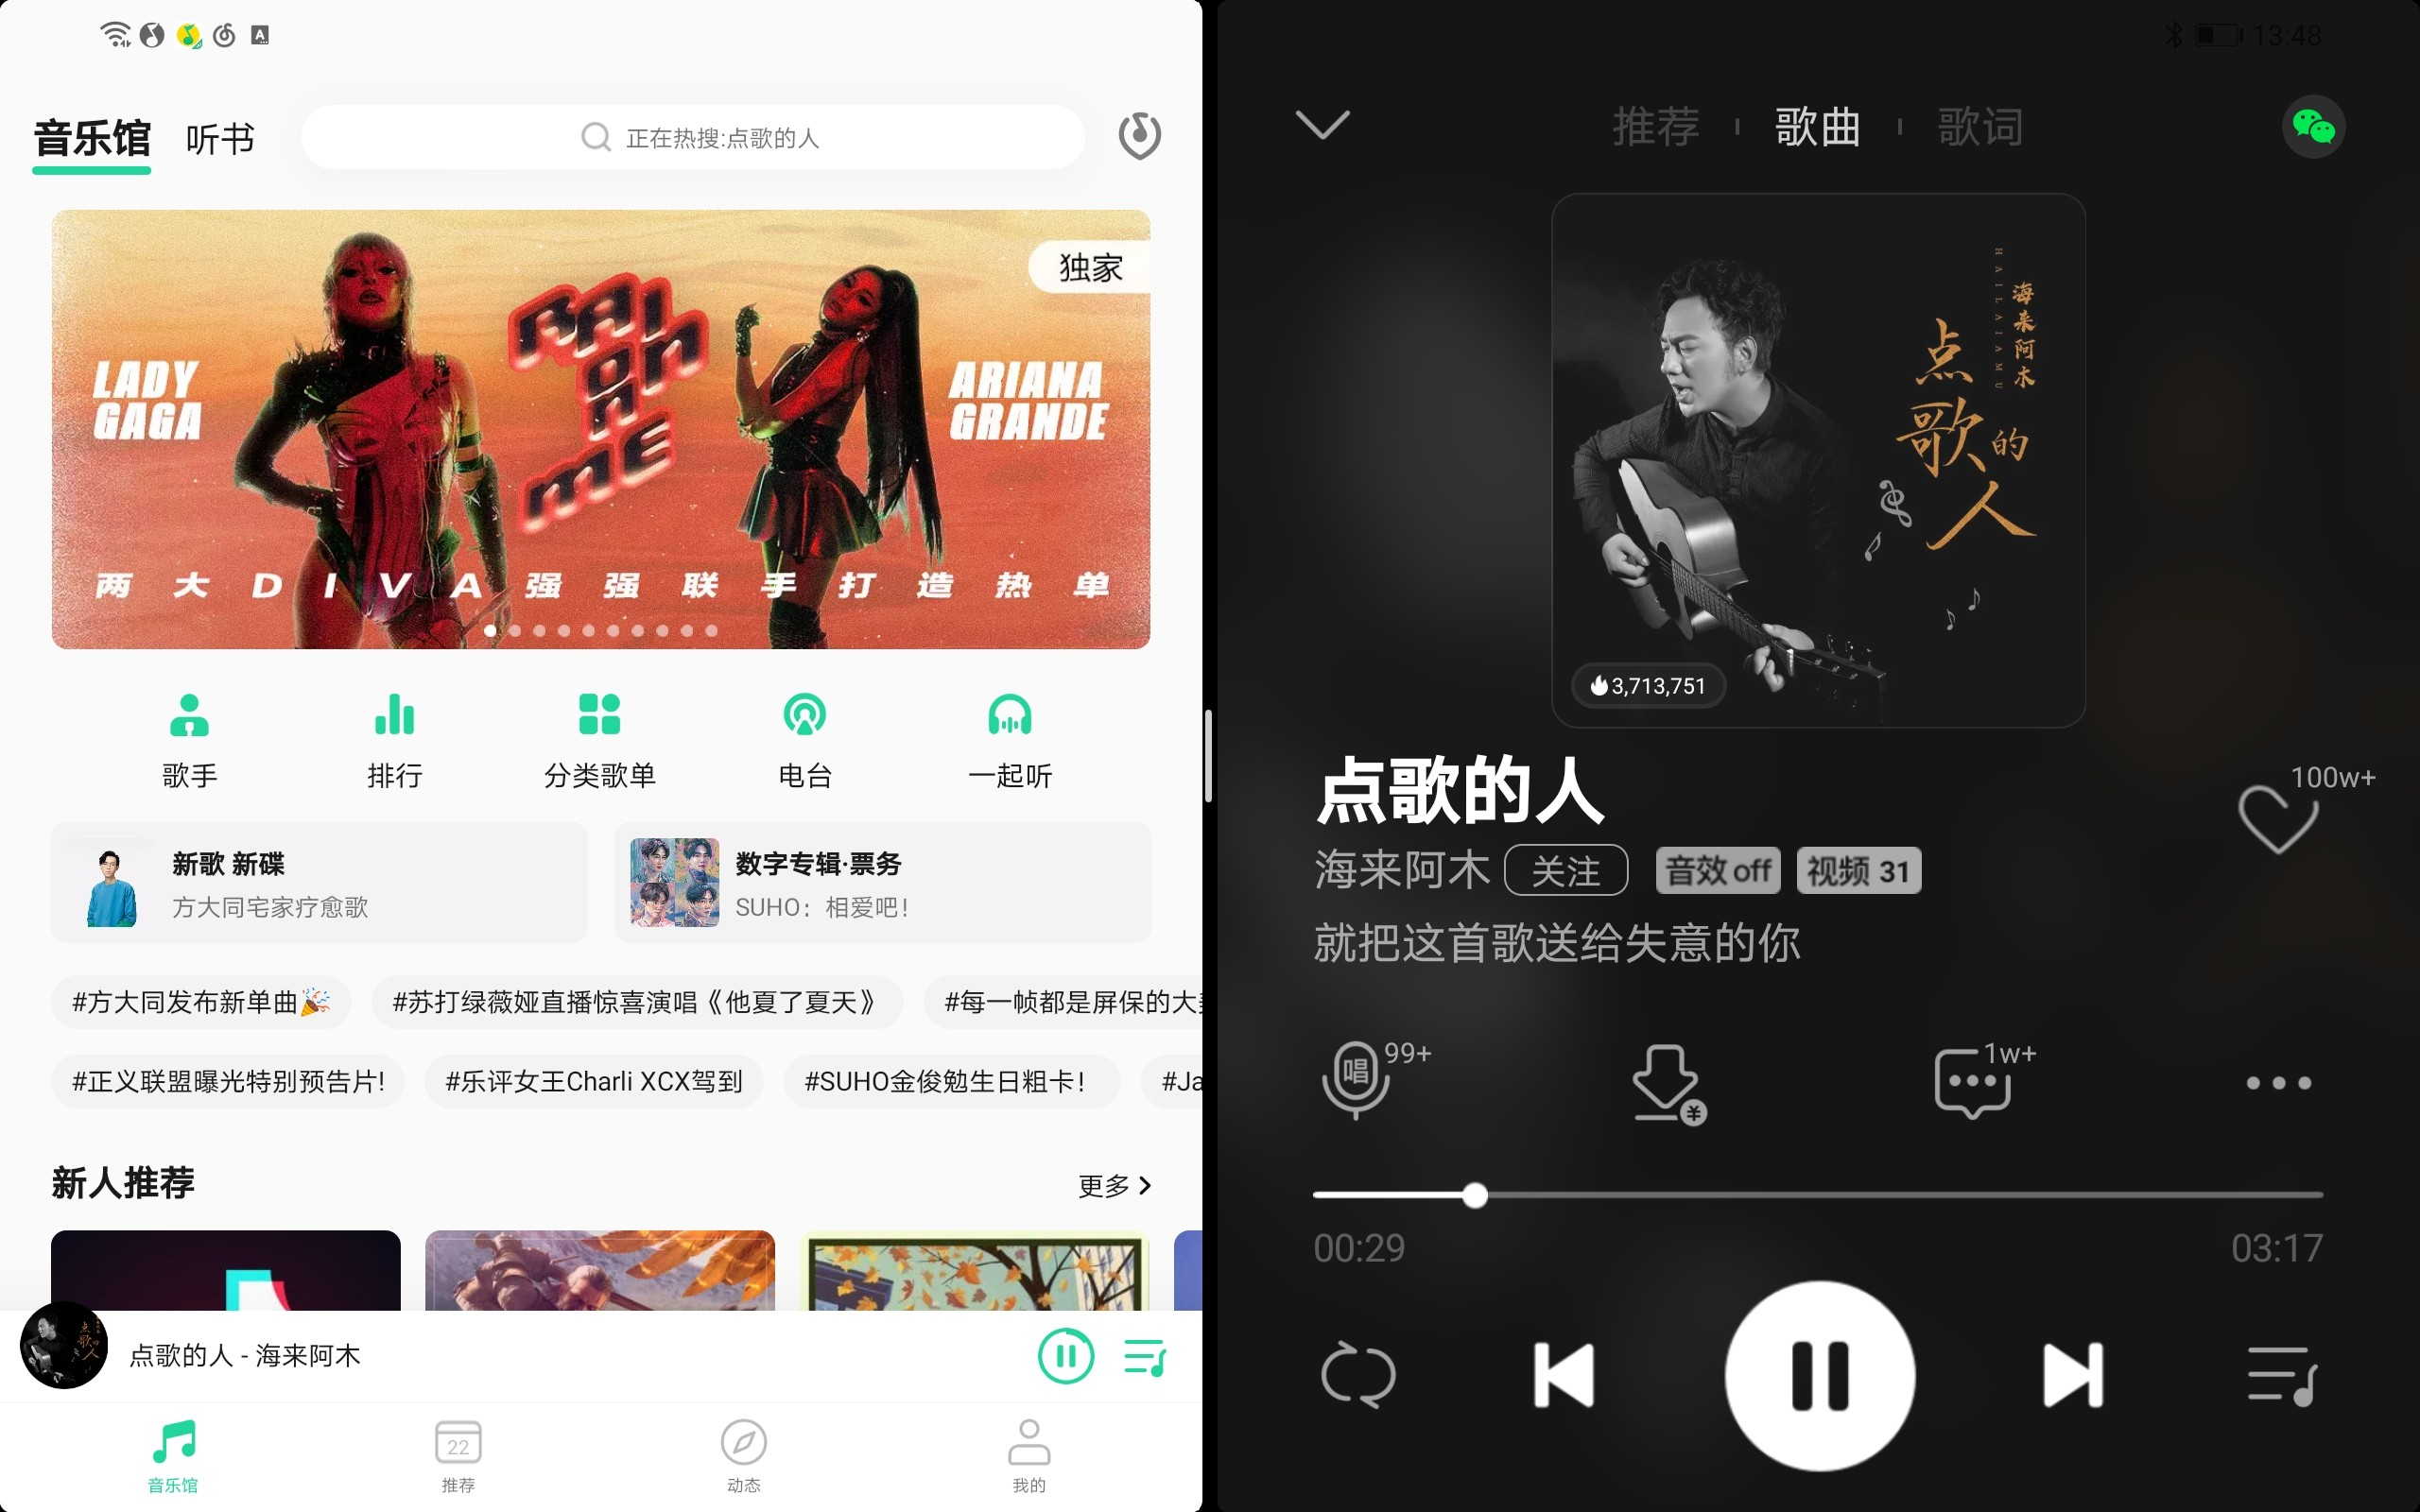 Screenshot_20200522_134820_com.tencent.qqmusic.jpg